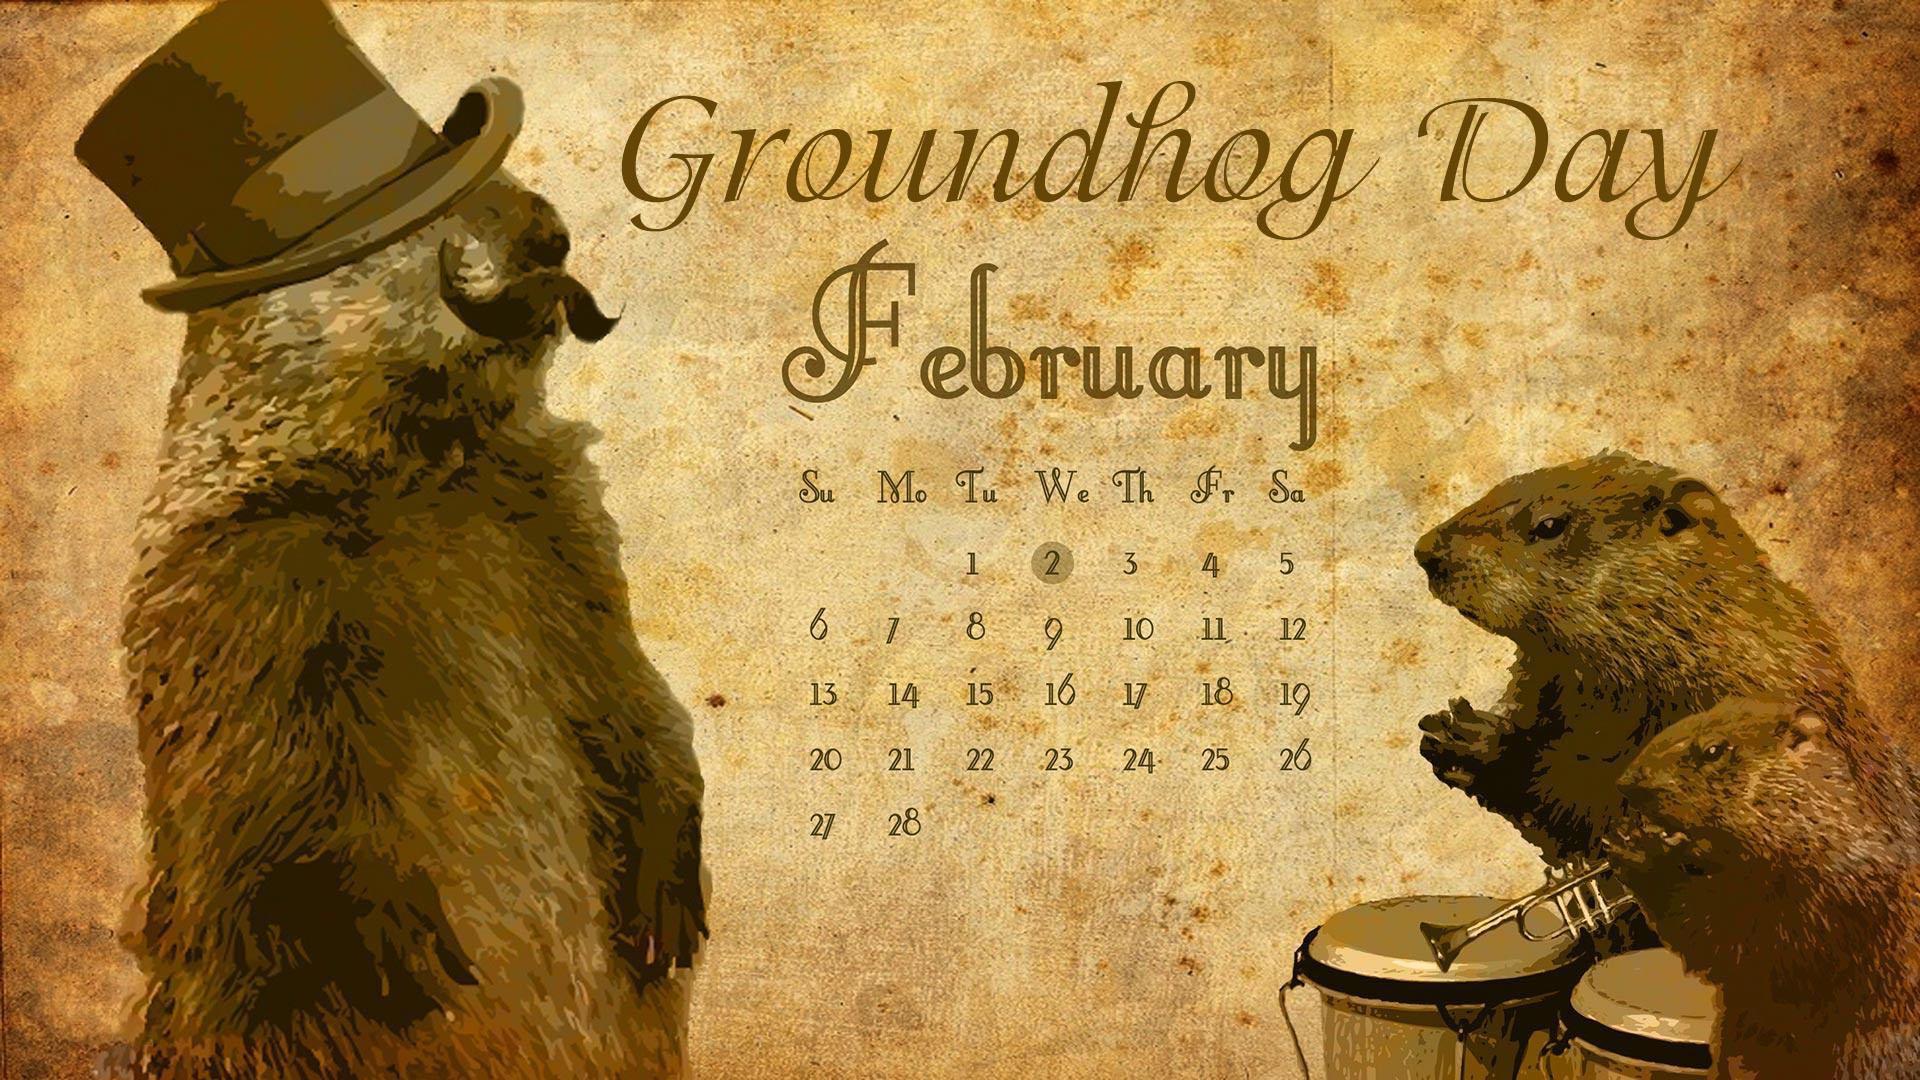 February 2 Groundhog Day Digital Signage Graphic